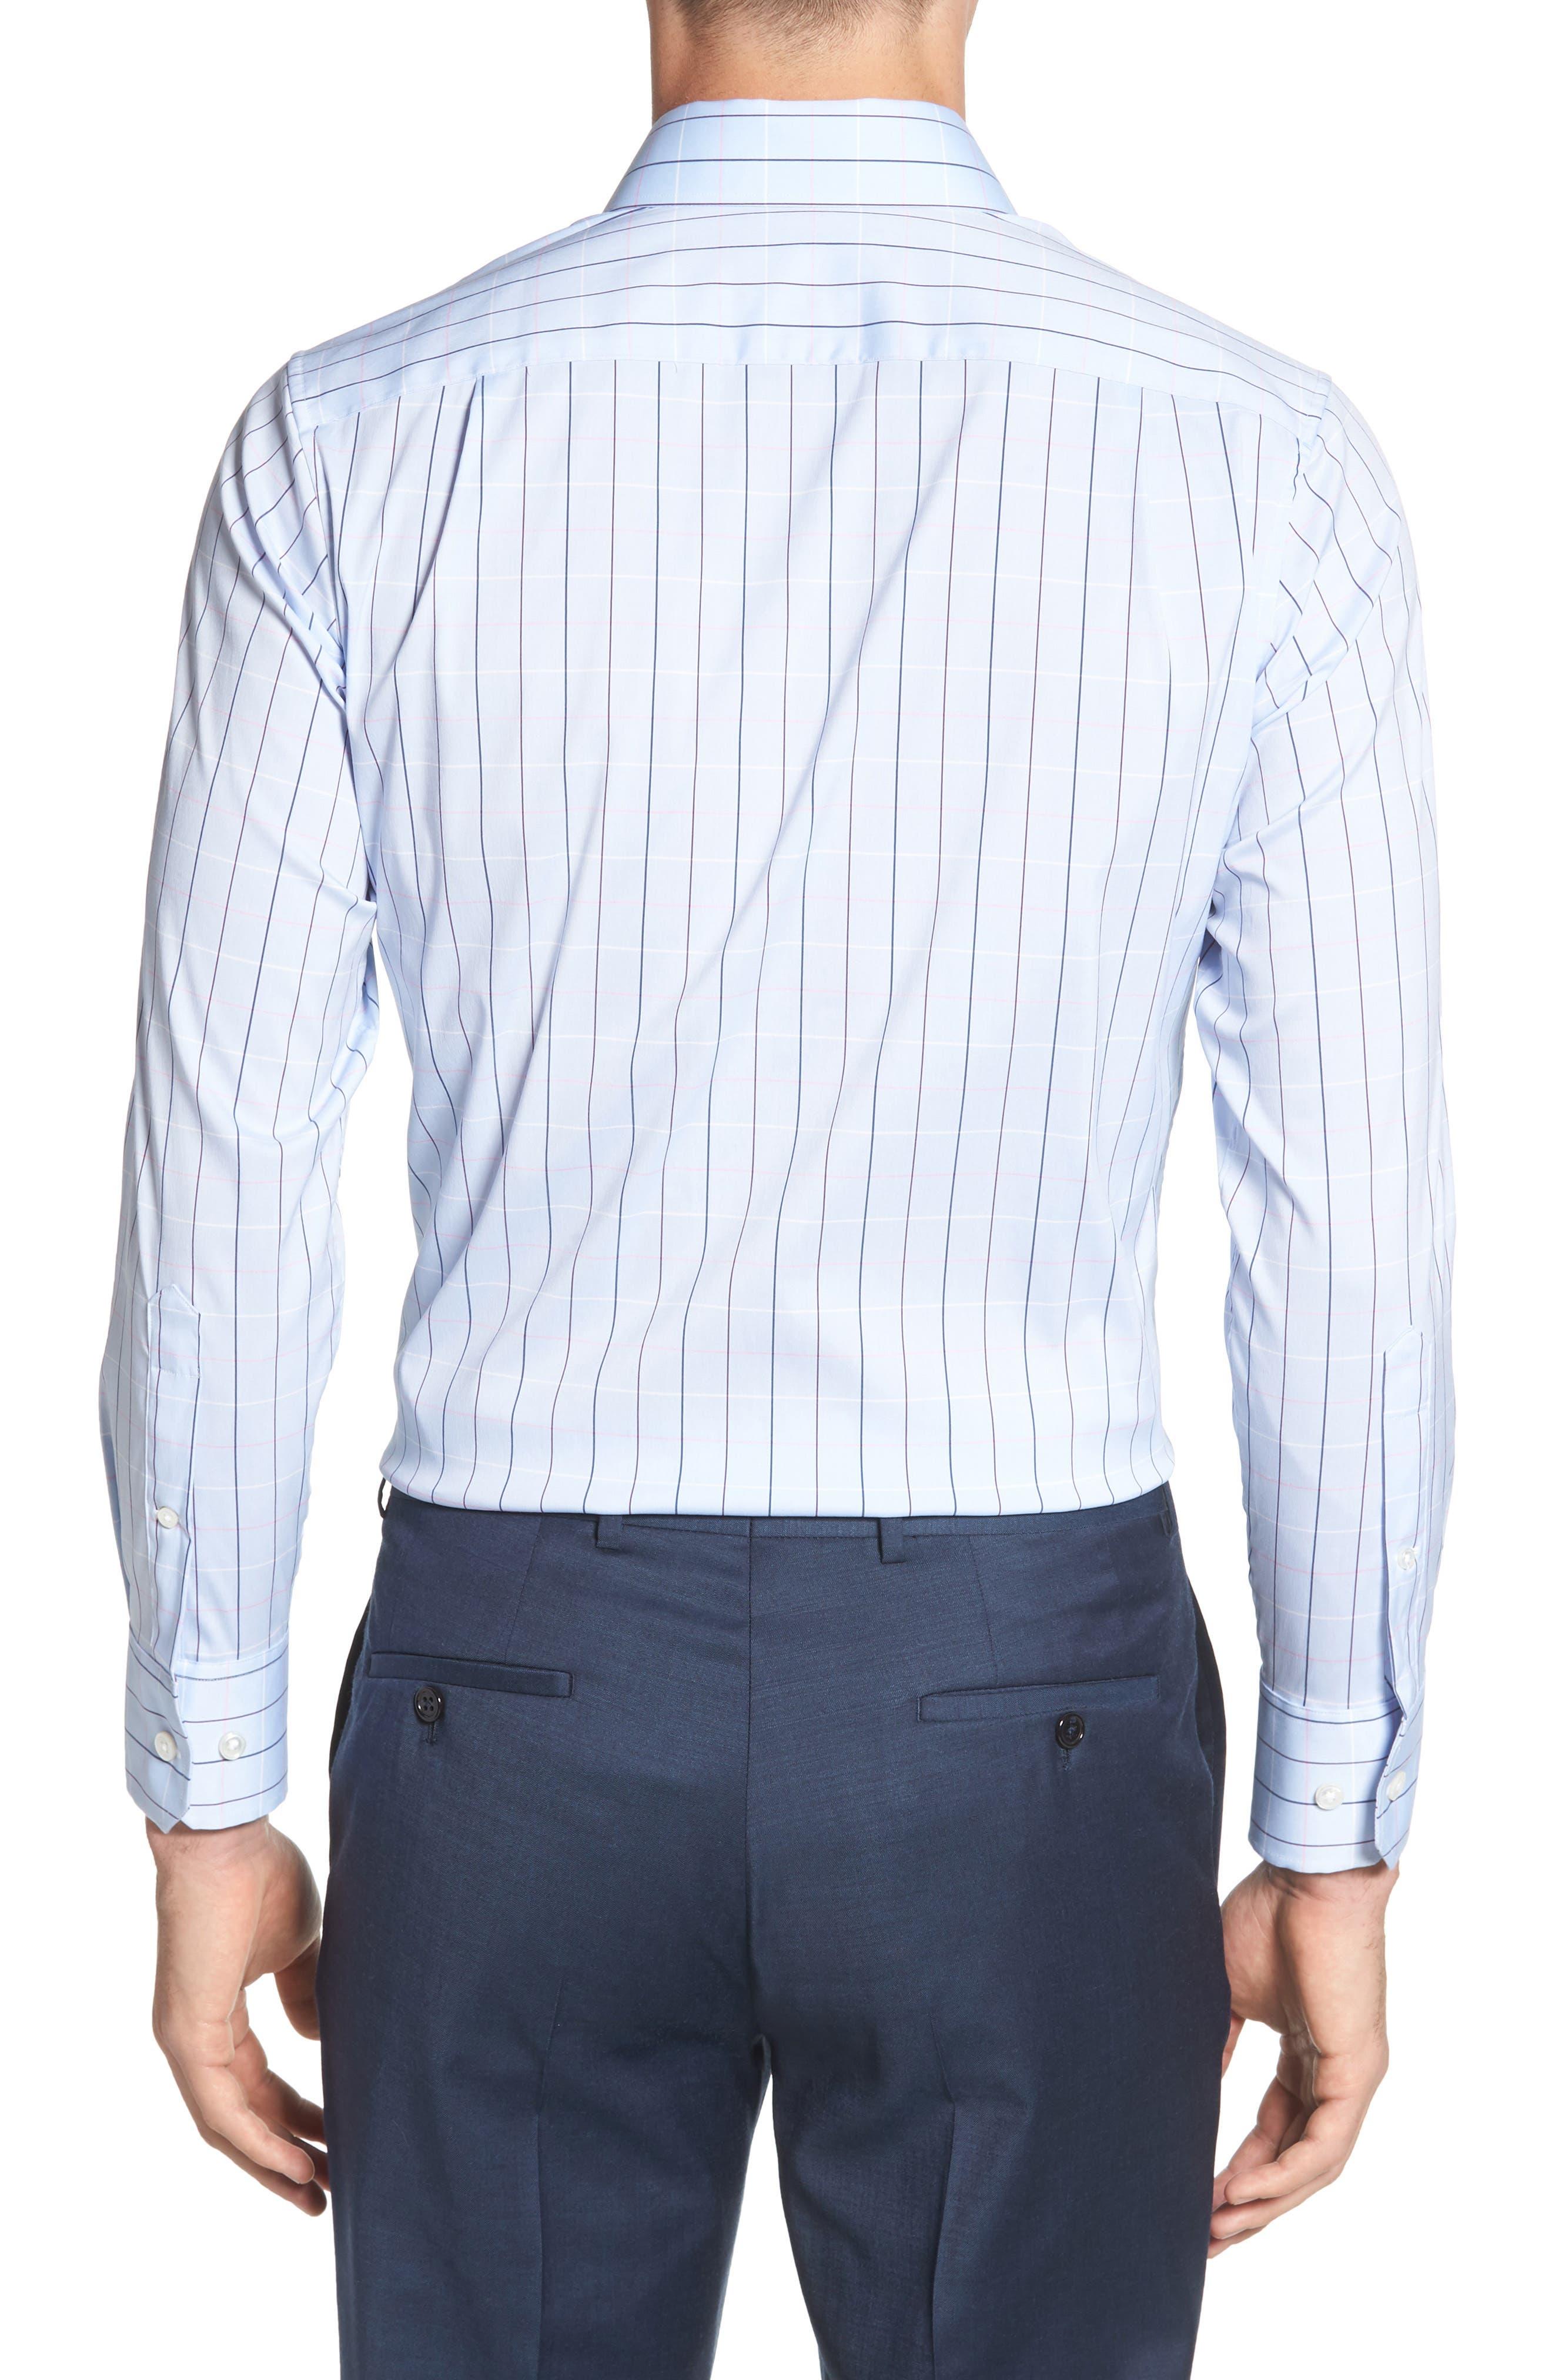 Jetsetter Slim Fit Stretch Check Dress Shirt,                             Alternate thumbnail 3, color,                             400